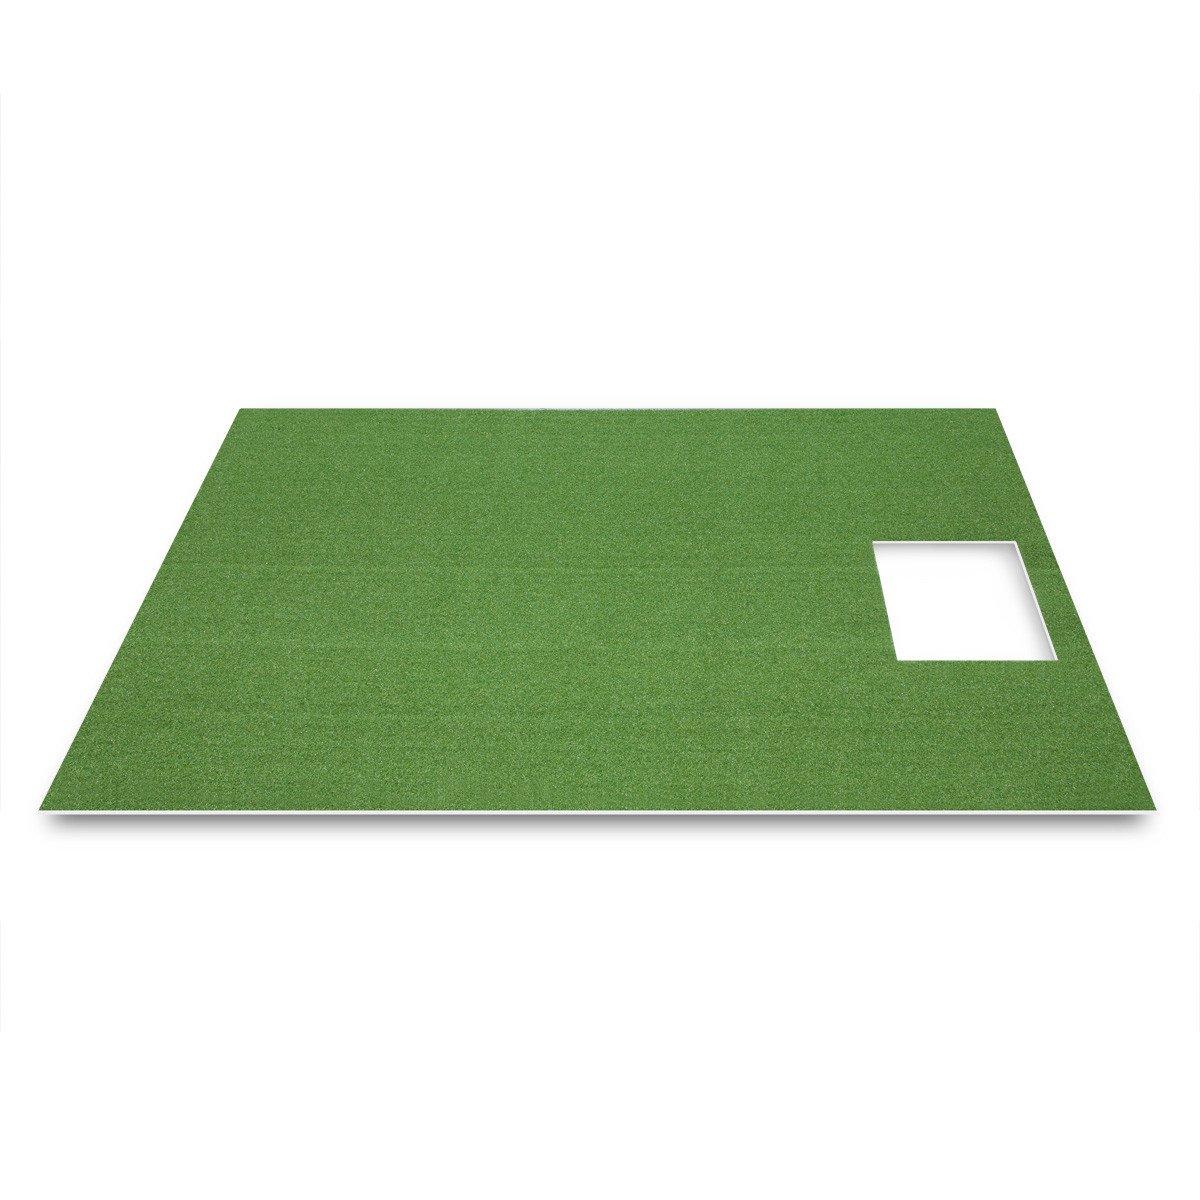 full mats youtube durapro version watch golf fairwaypro mat